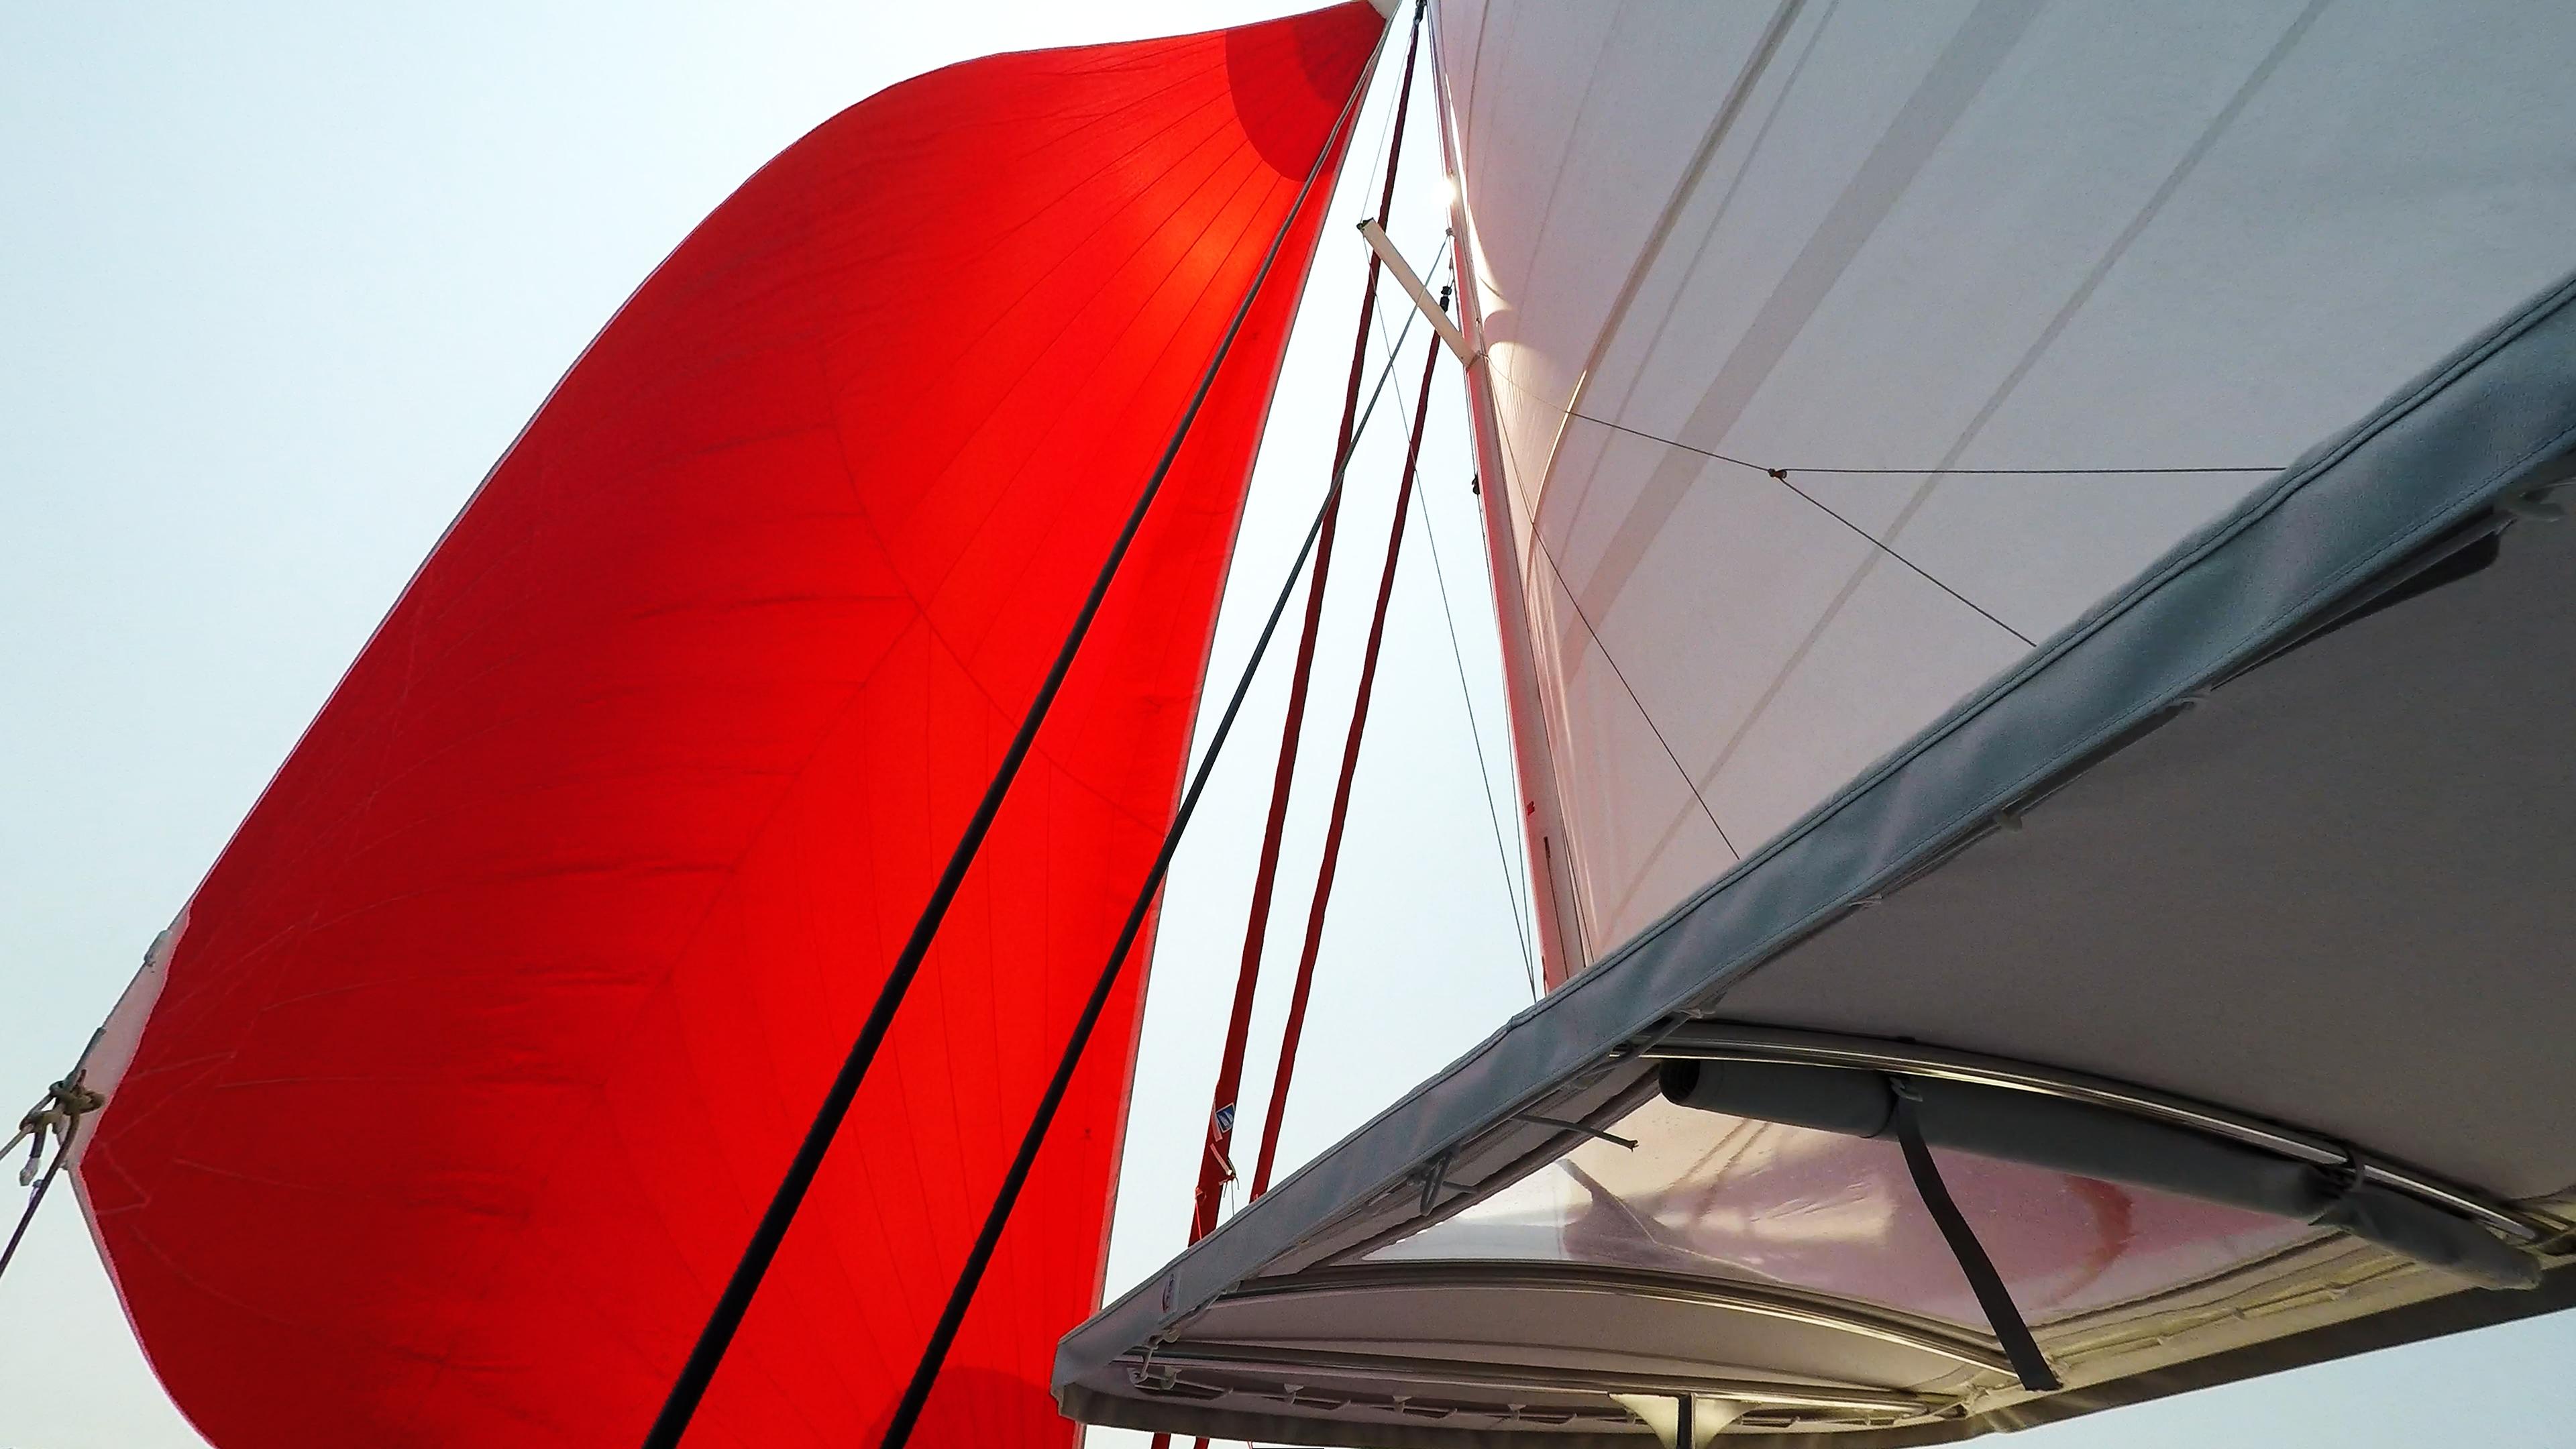 rosso gennaker e bianco mail vela over cockpit cima sul trimarano neel 45